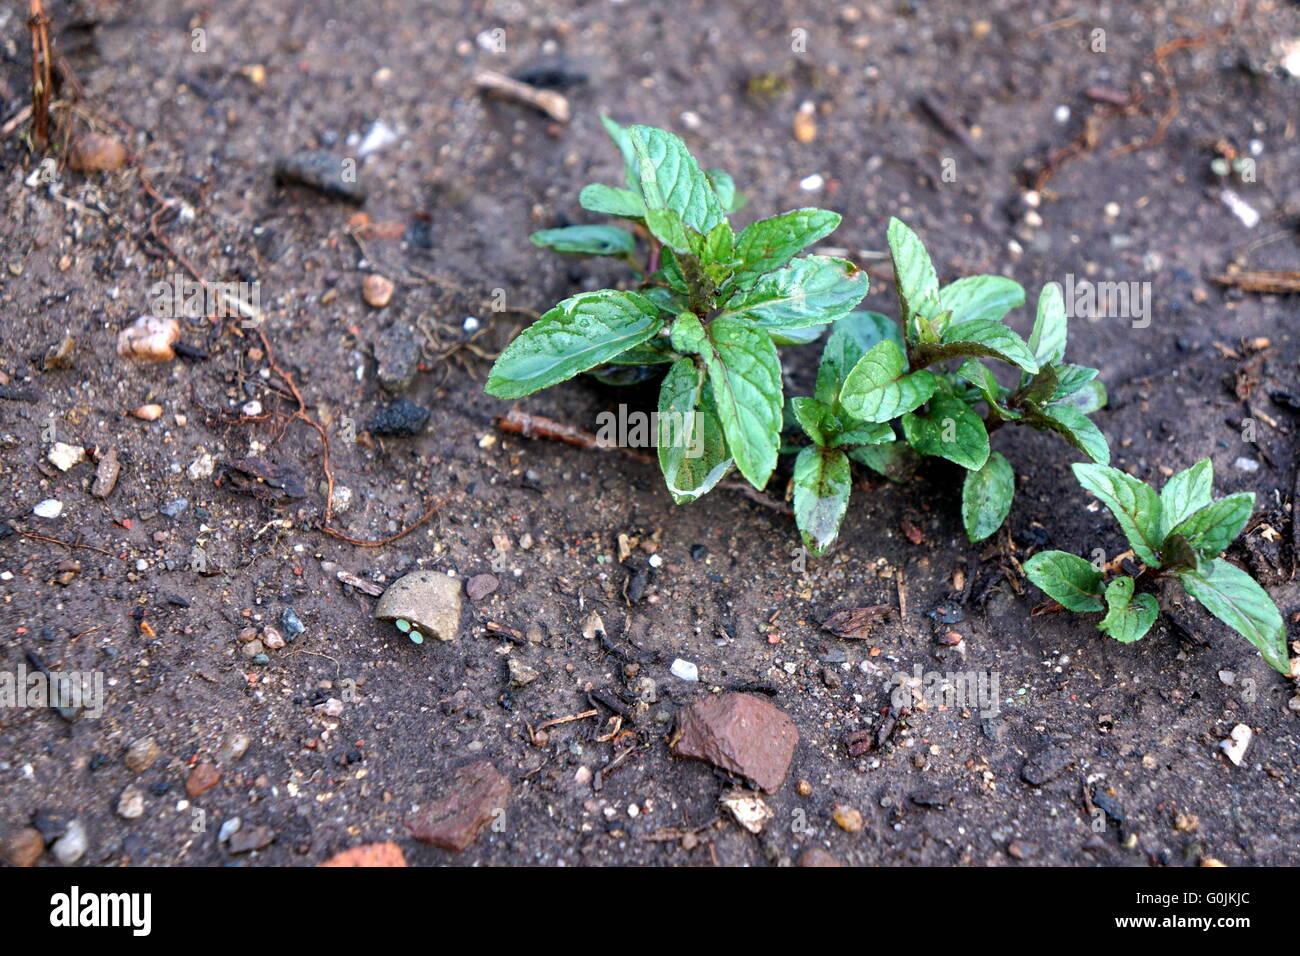 Chocolate Mint Plant Stock Photo, Royalty Free Image: 103672756 ...